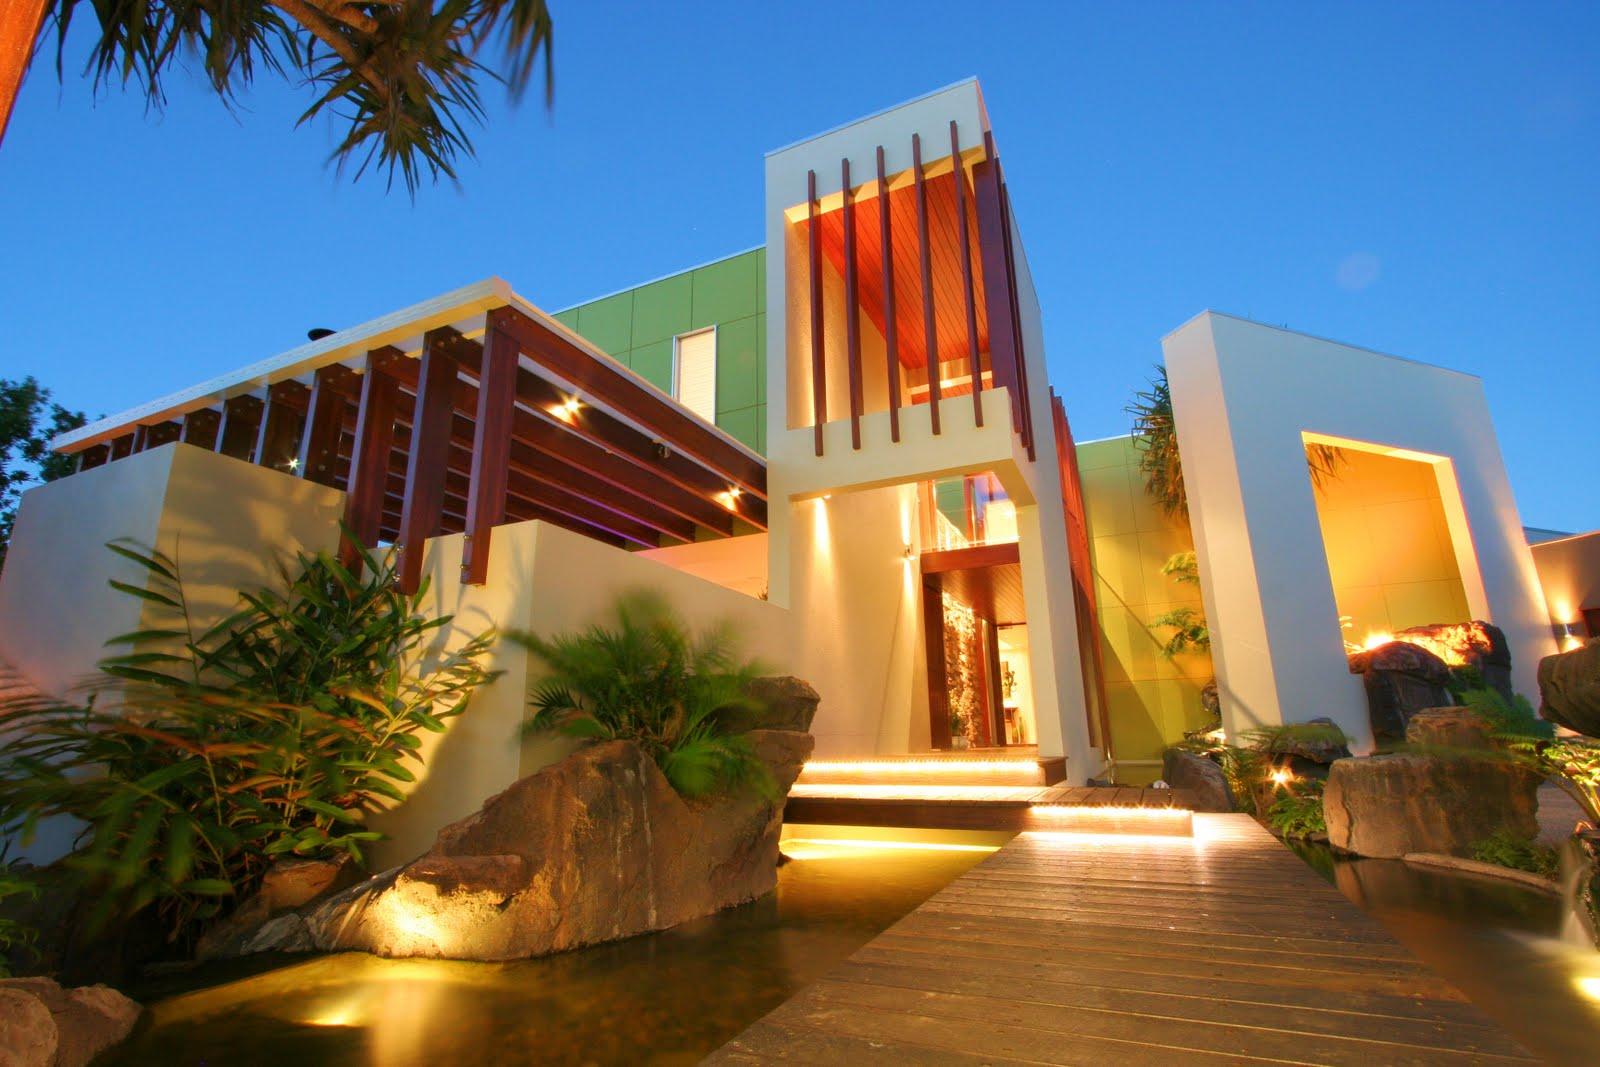 10 Modern Home Design Ideas